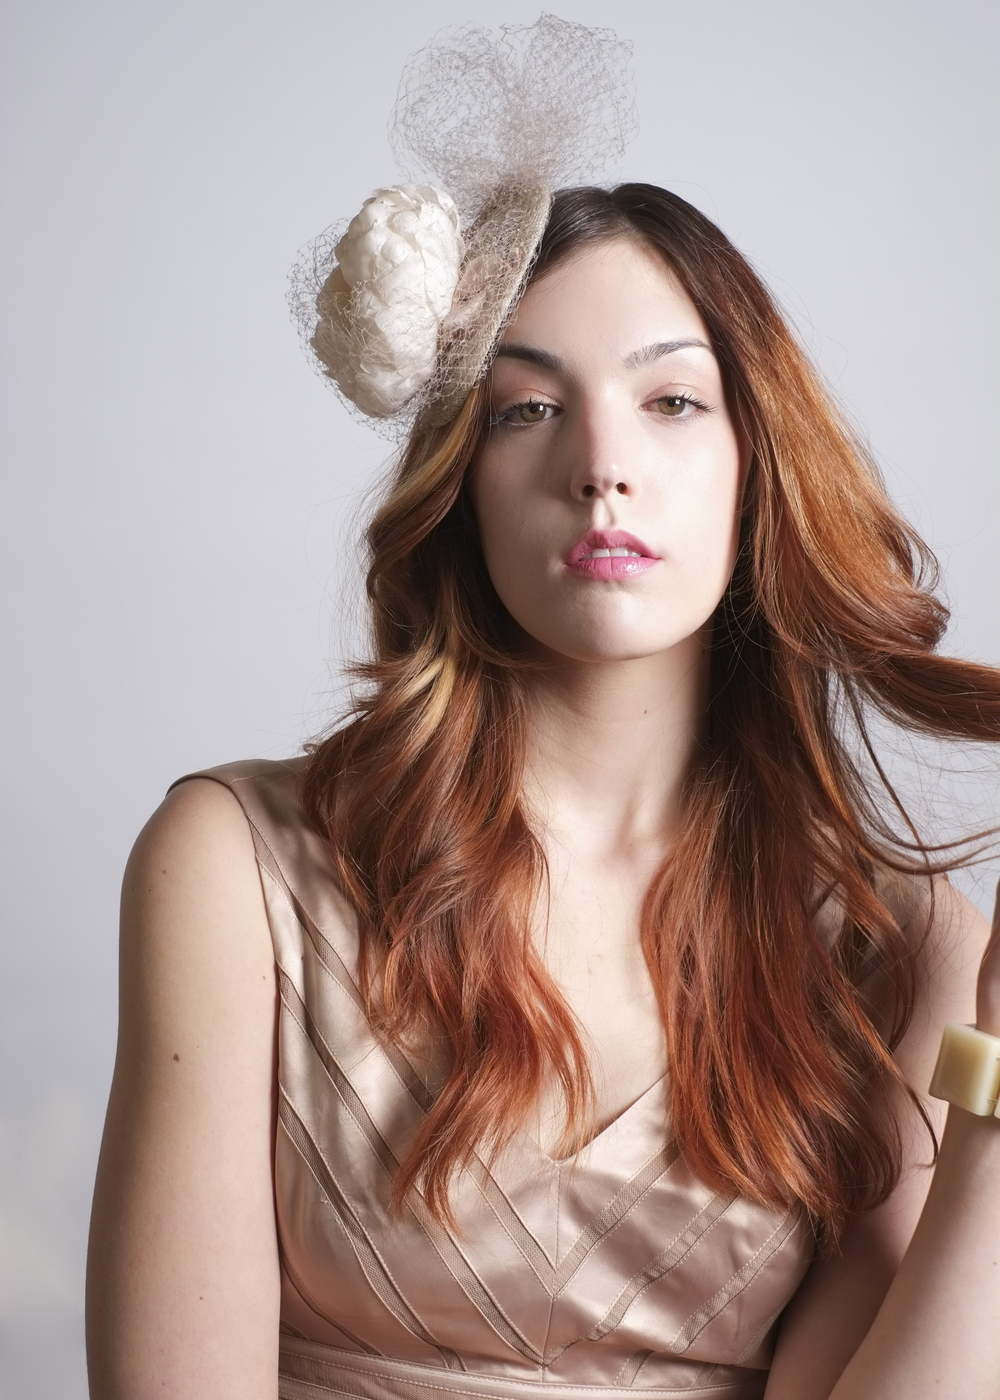 Fanny and June Spring 2014 Hat - Fascinator with vintage veil